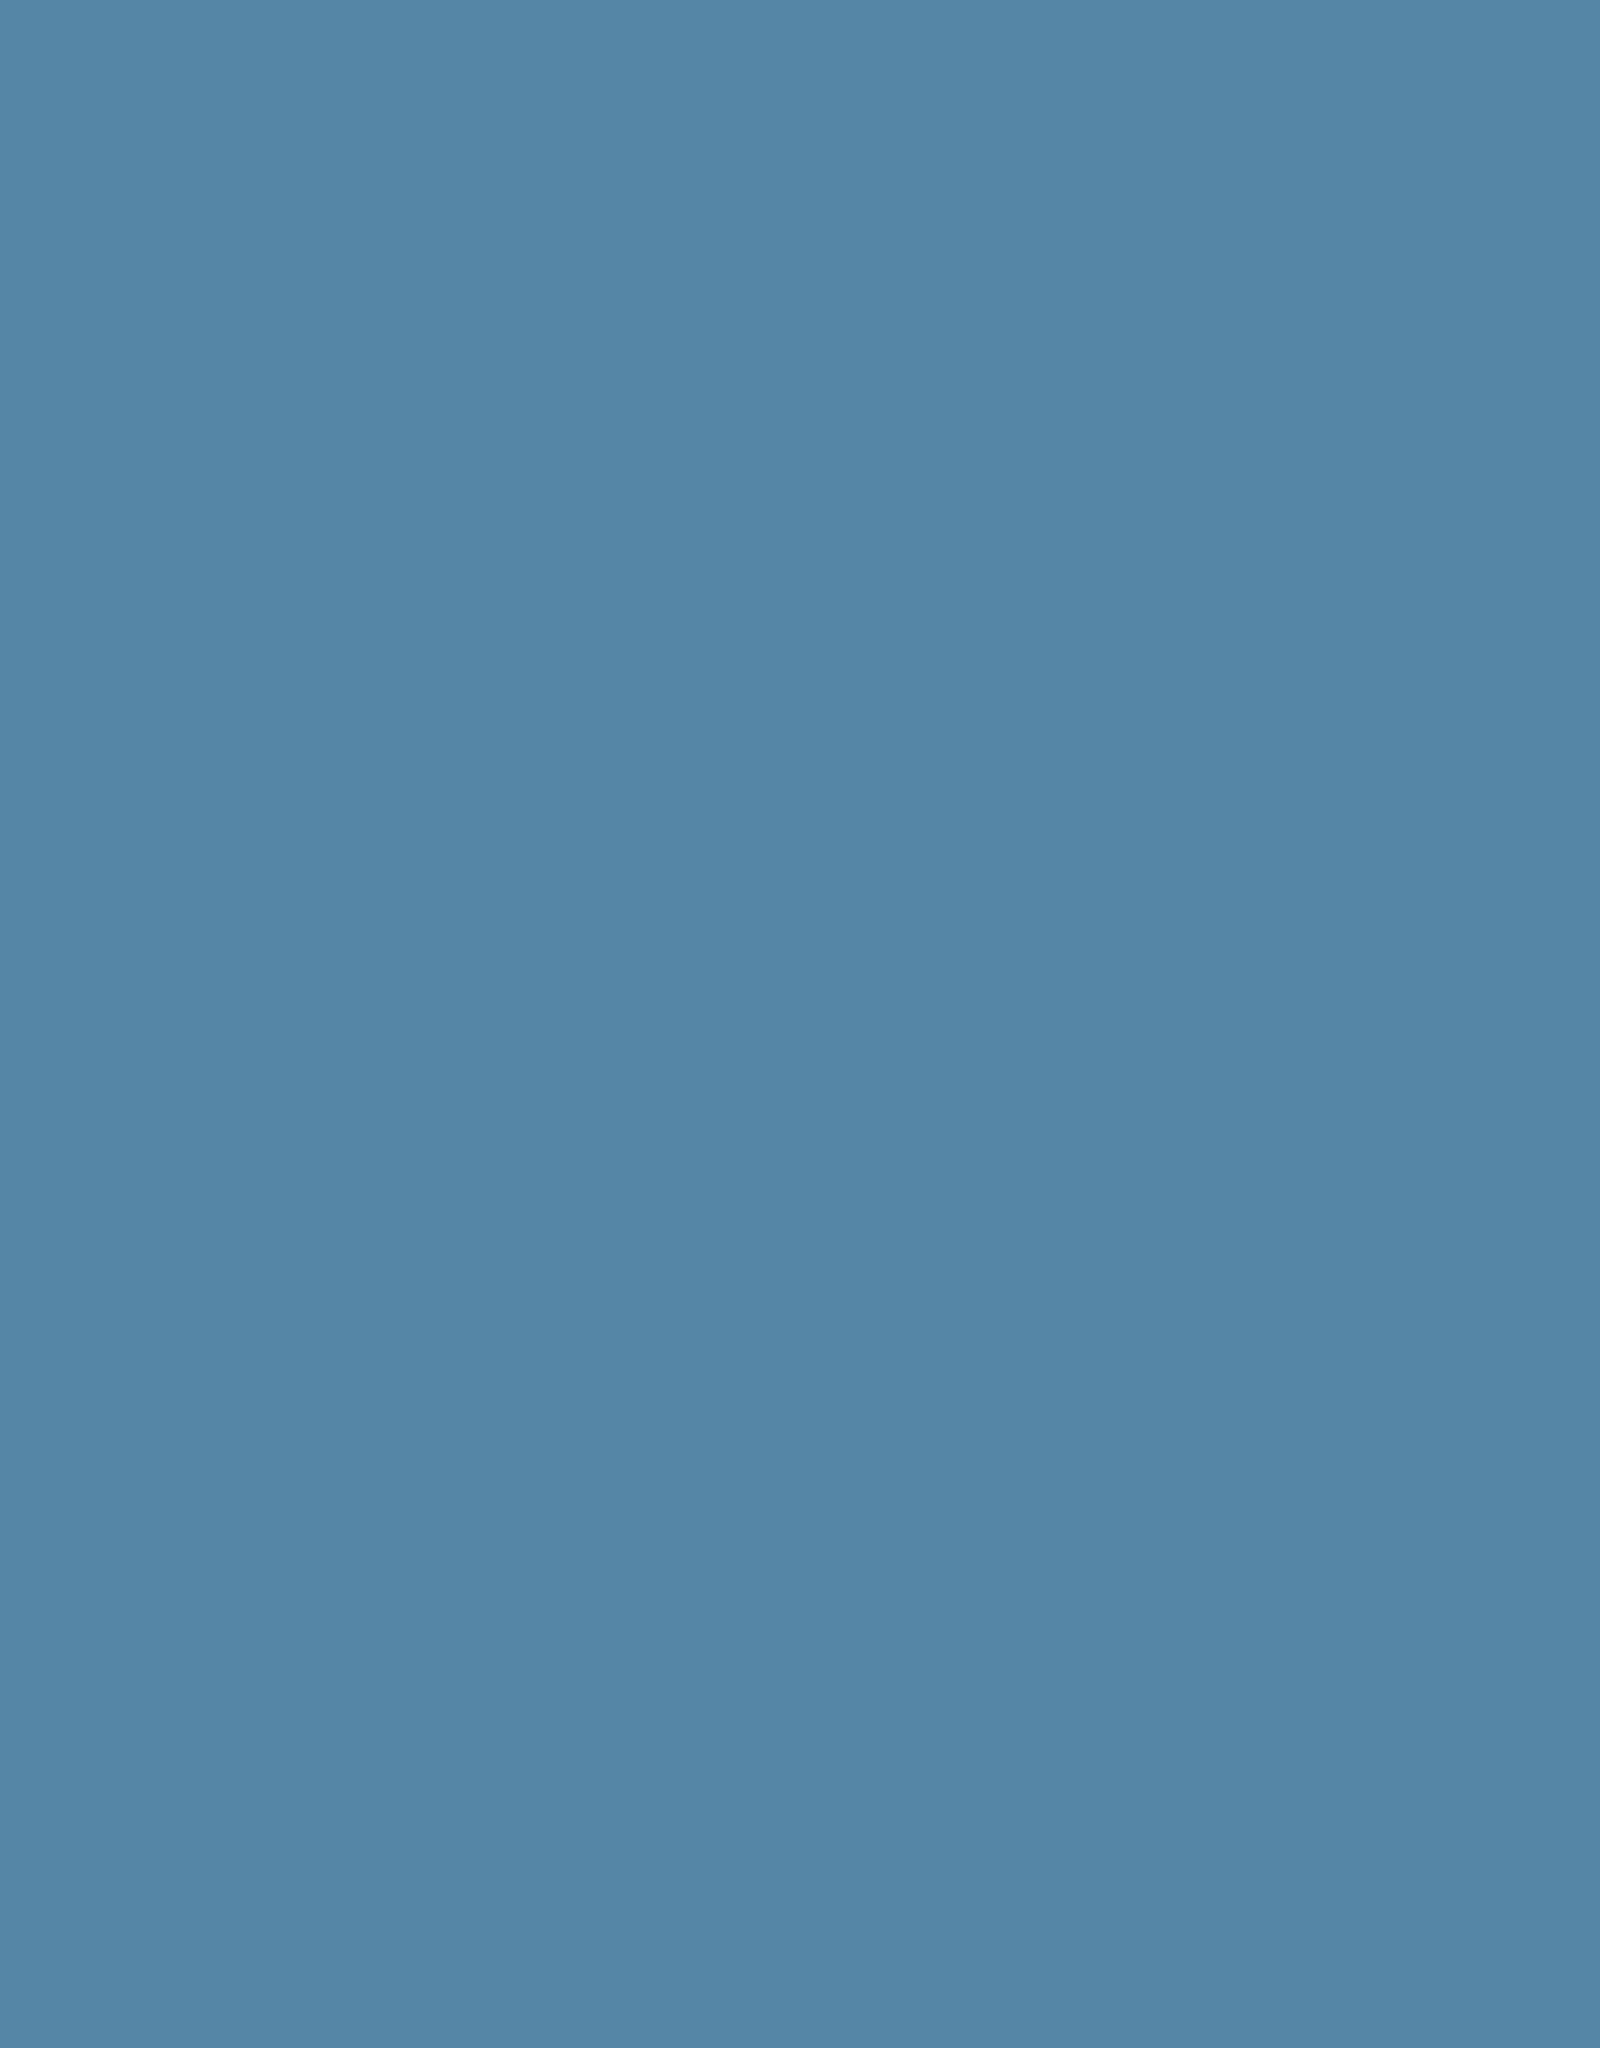 Superior Seamless Superior Seamless 9' Marine Blue #41